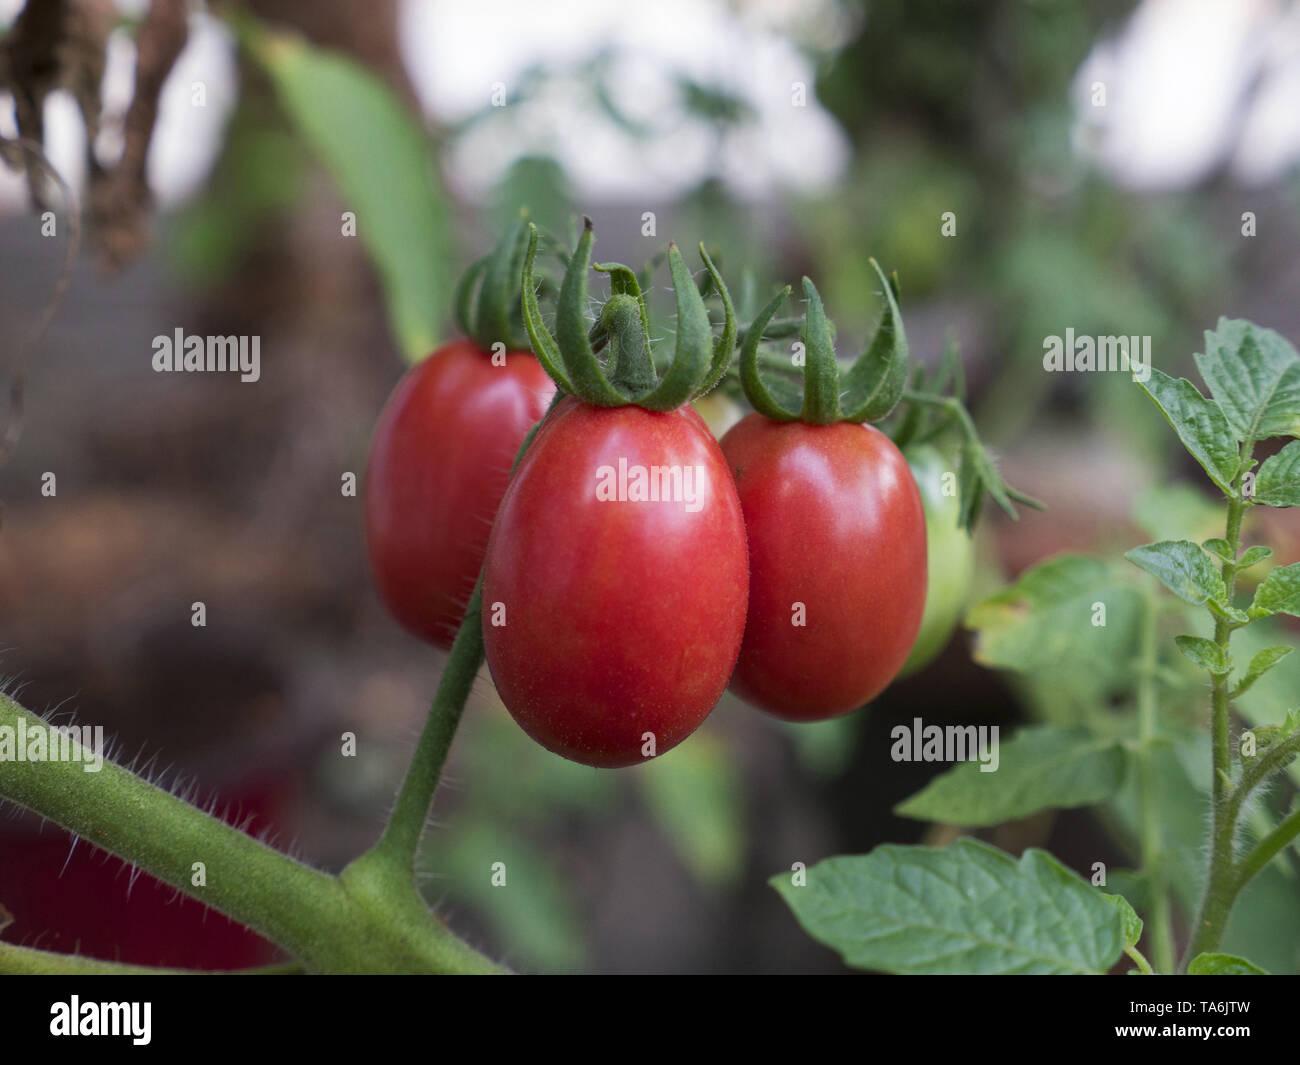 Tomatos - Stock Image